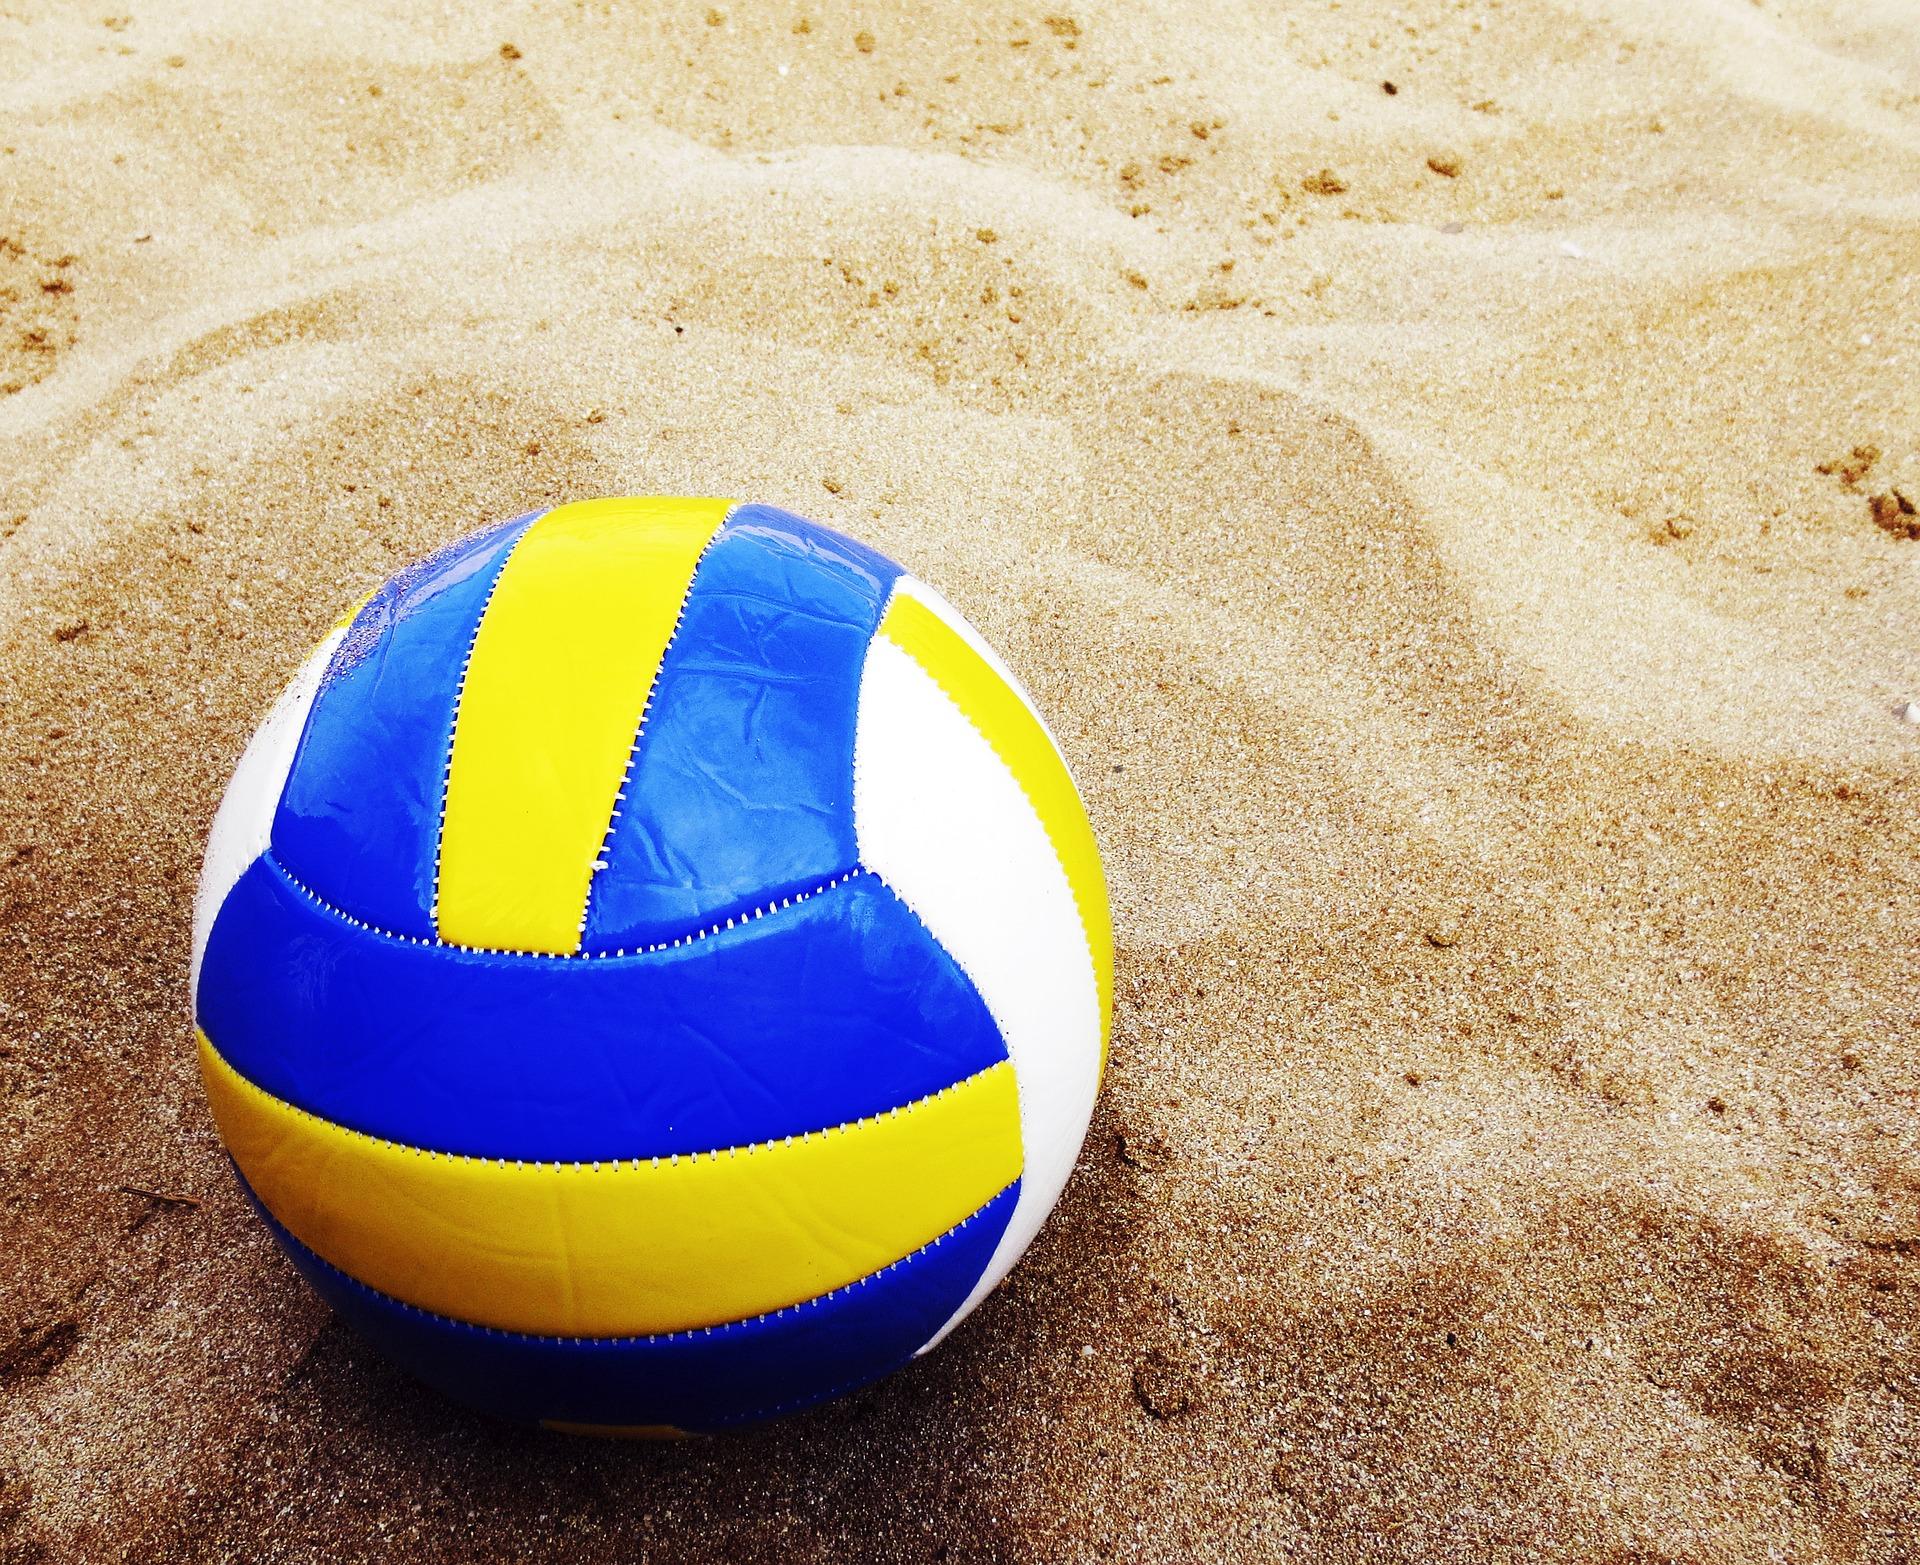 Beachvolleyboll ligger på sand.